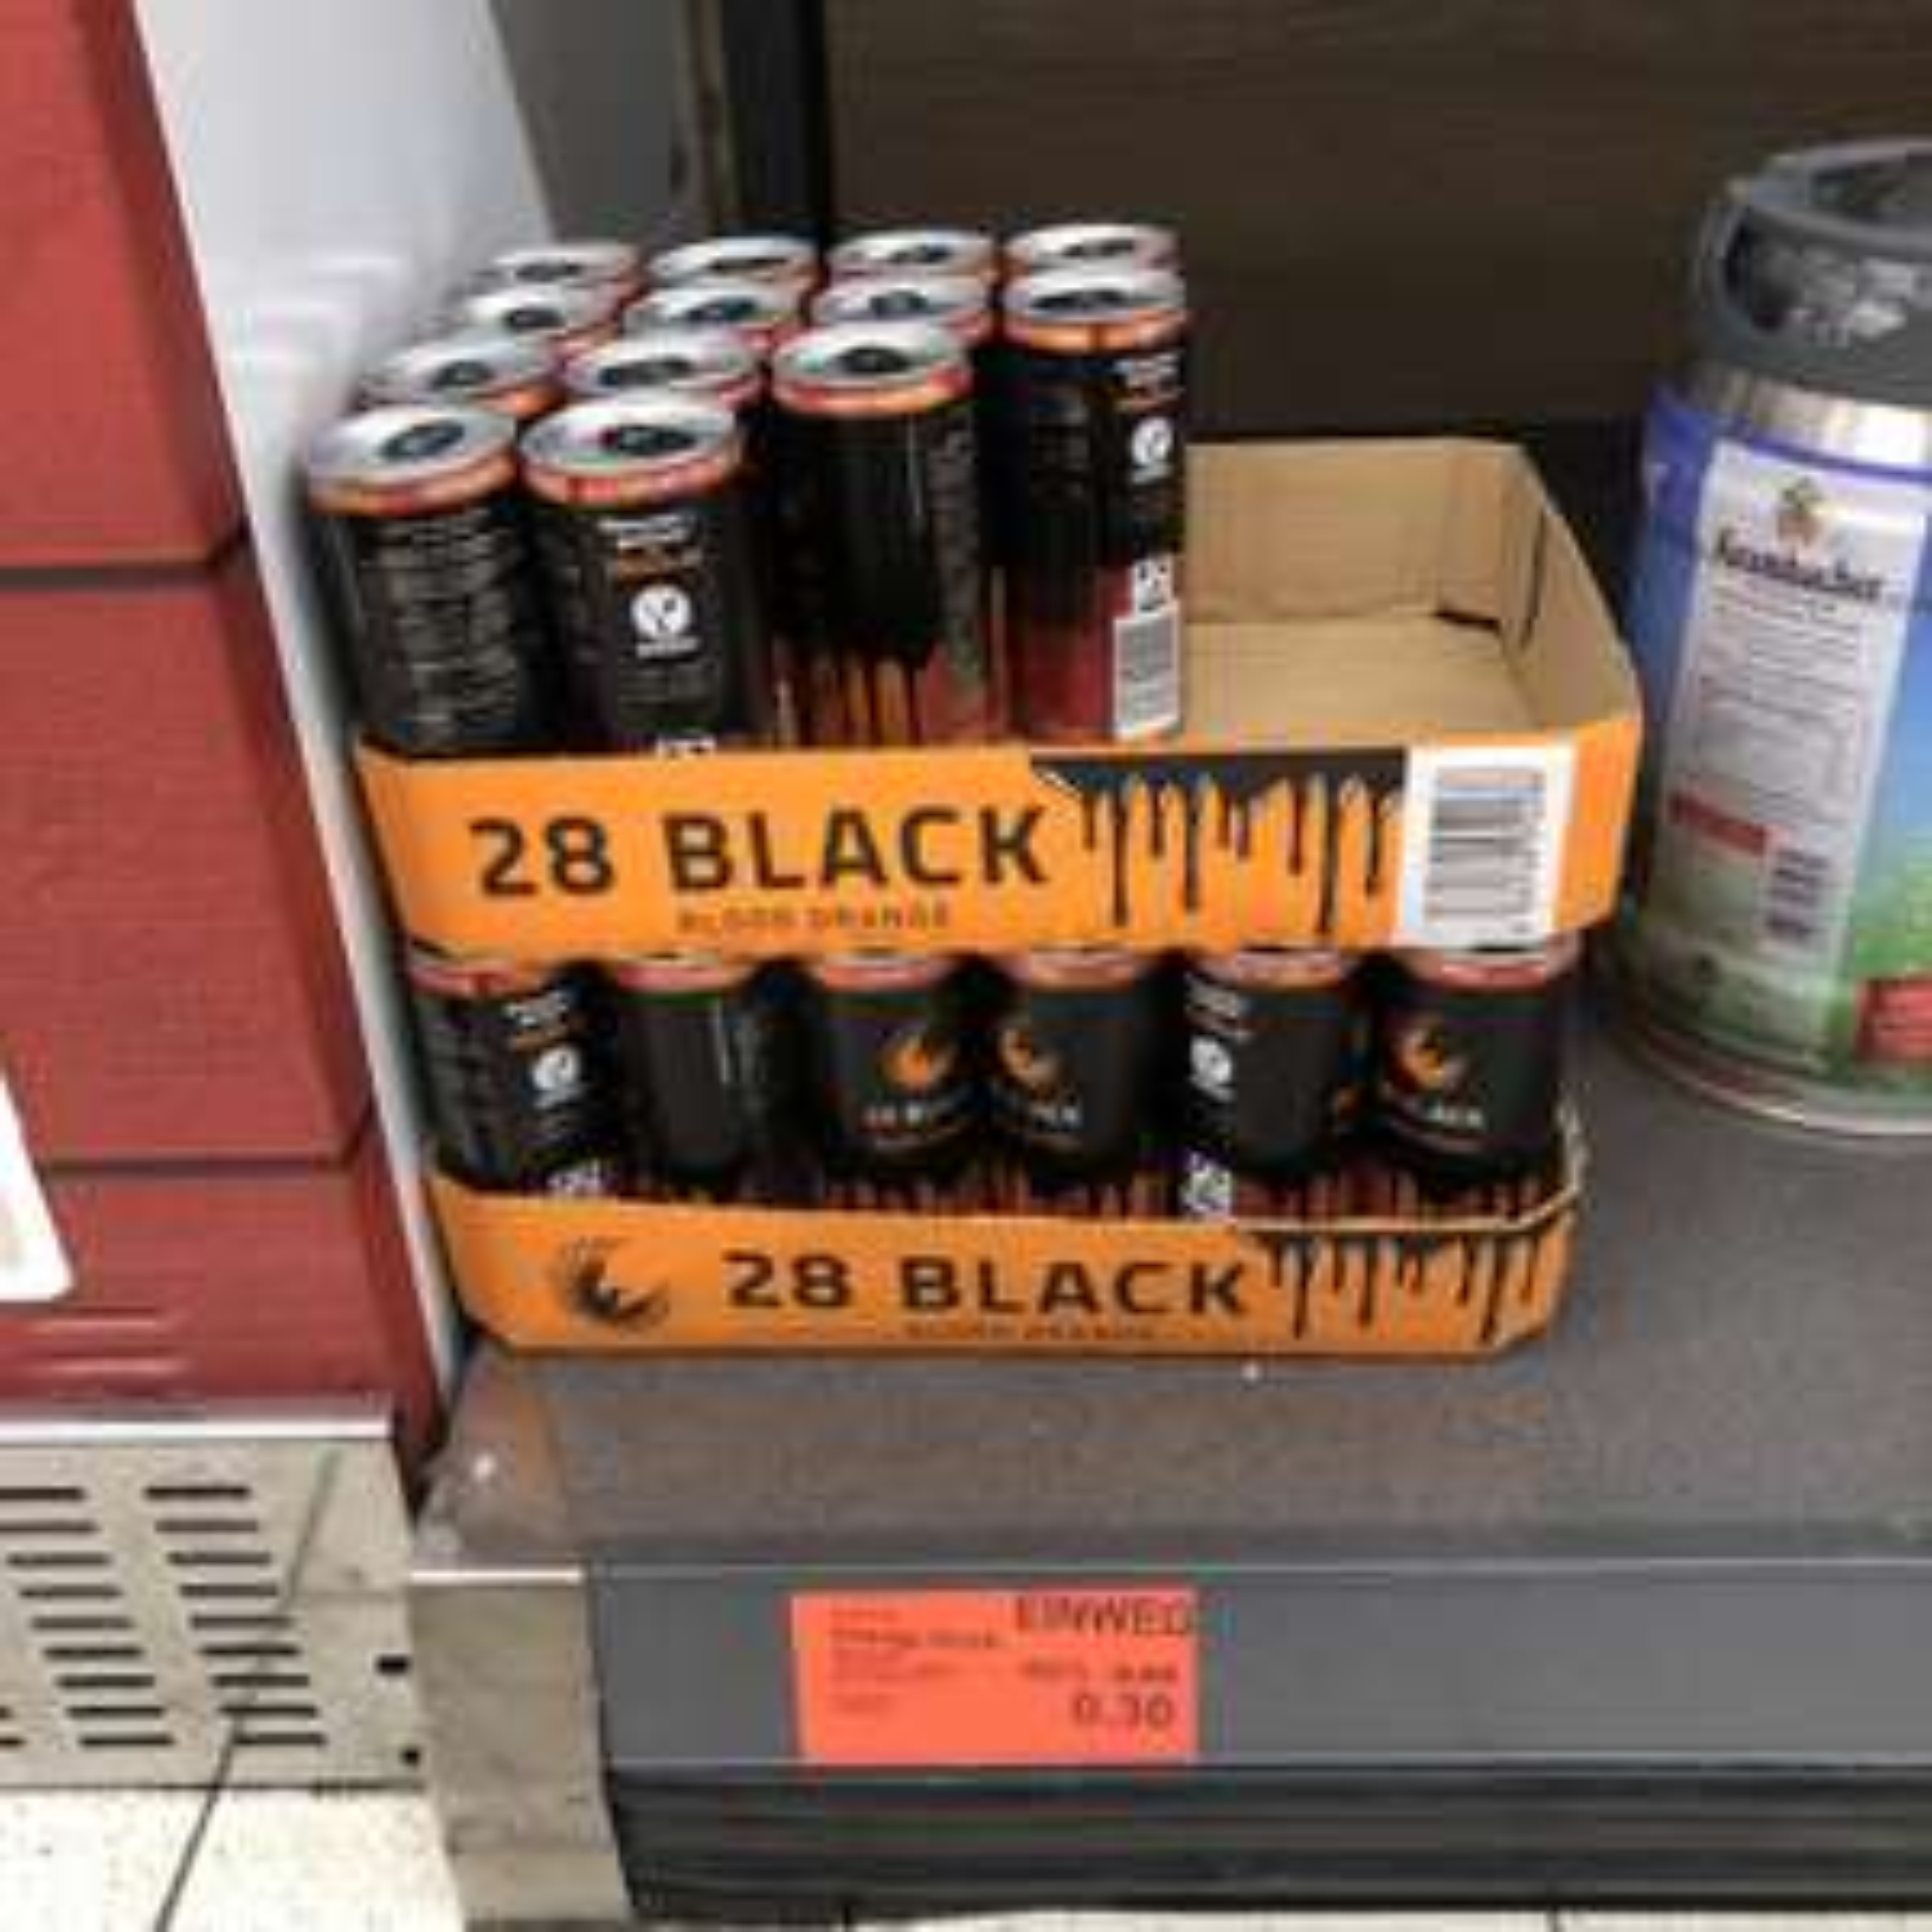 Energydrink 28 Black Blood Orange Lokal? (Mettmann)